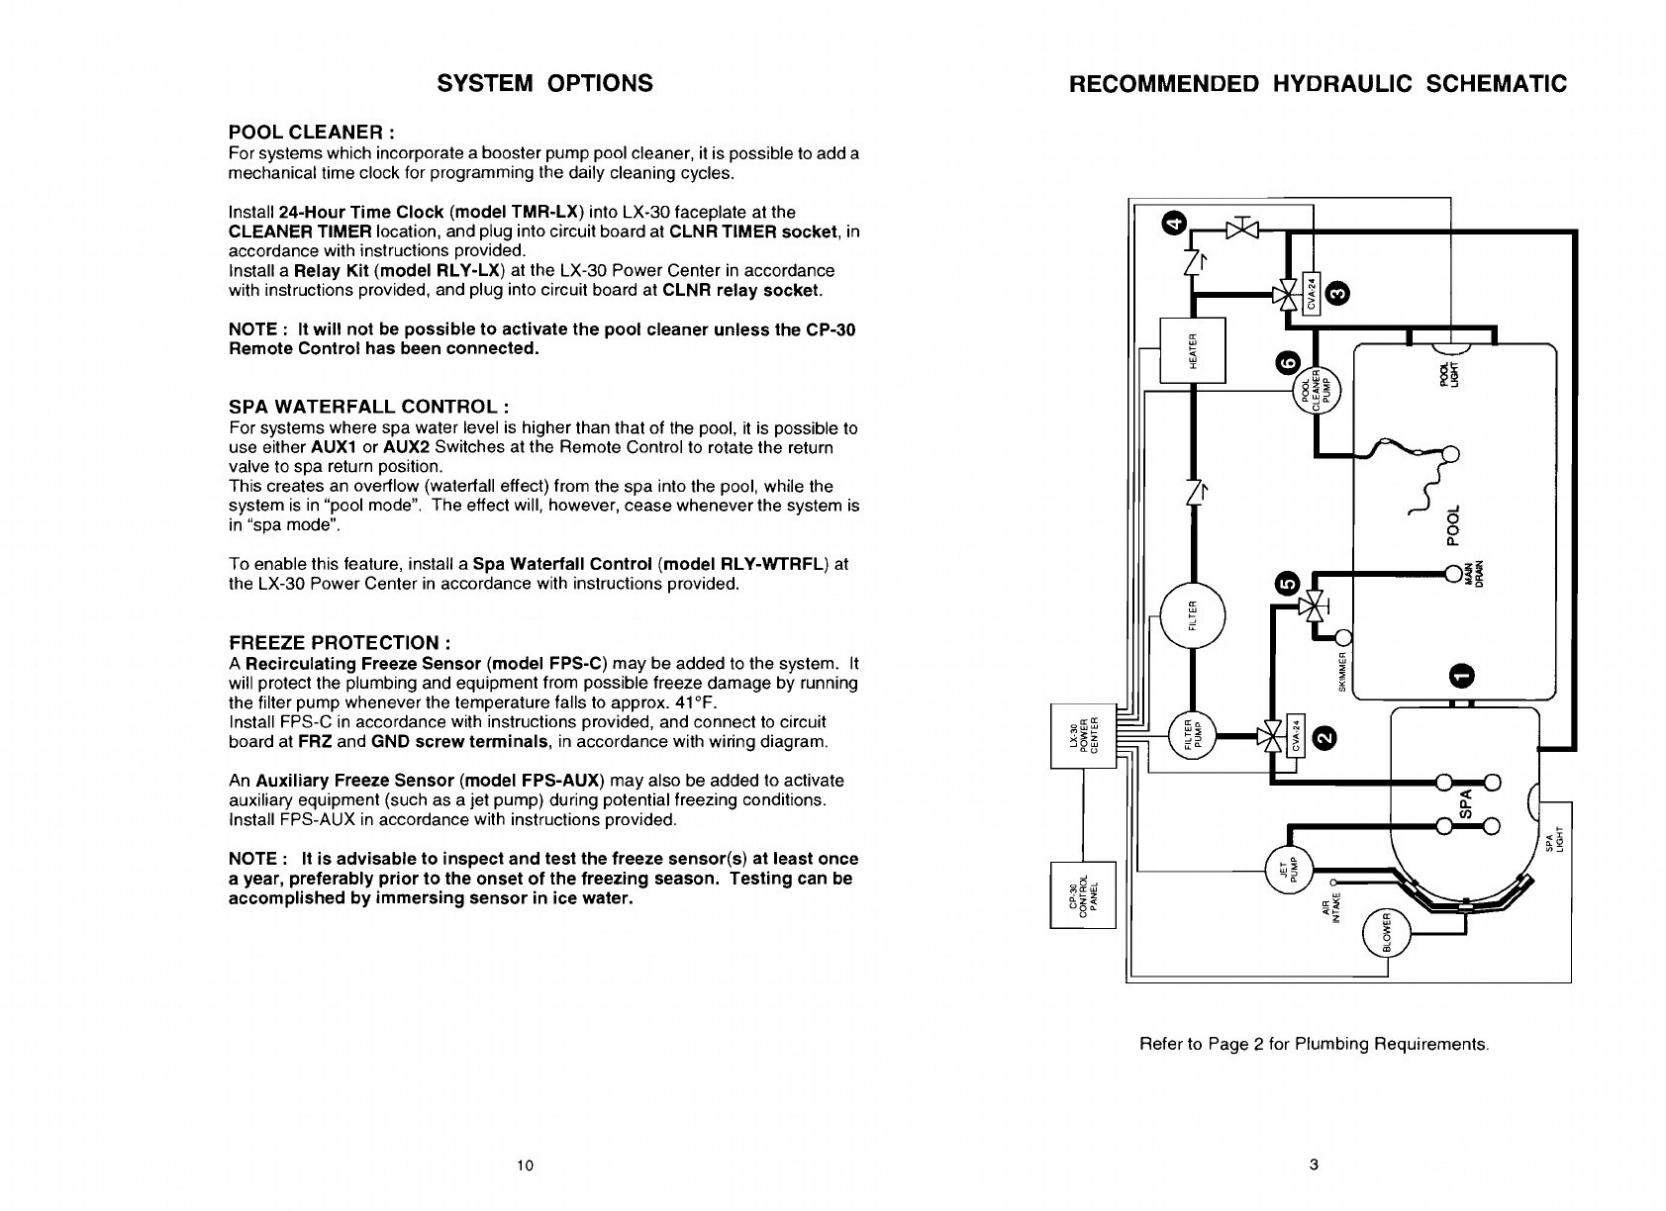 220V Pool Pump Wiring Diagram – Wiring Diagram Pool Pump Motor Best - Pool Pump Wiring Diagram